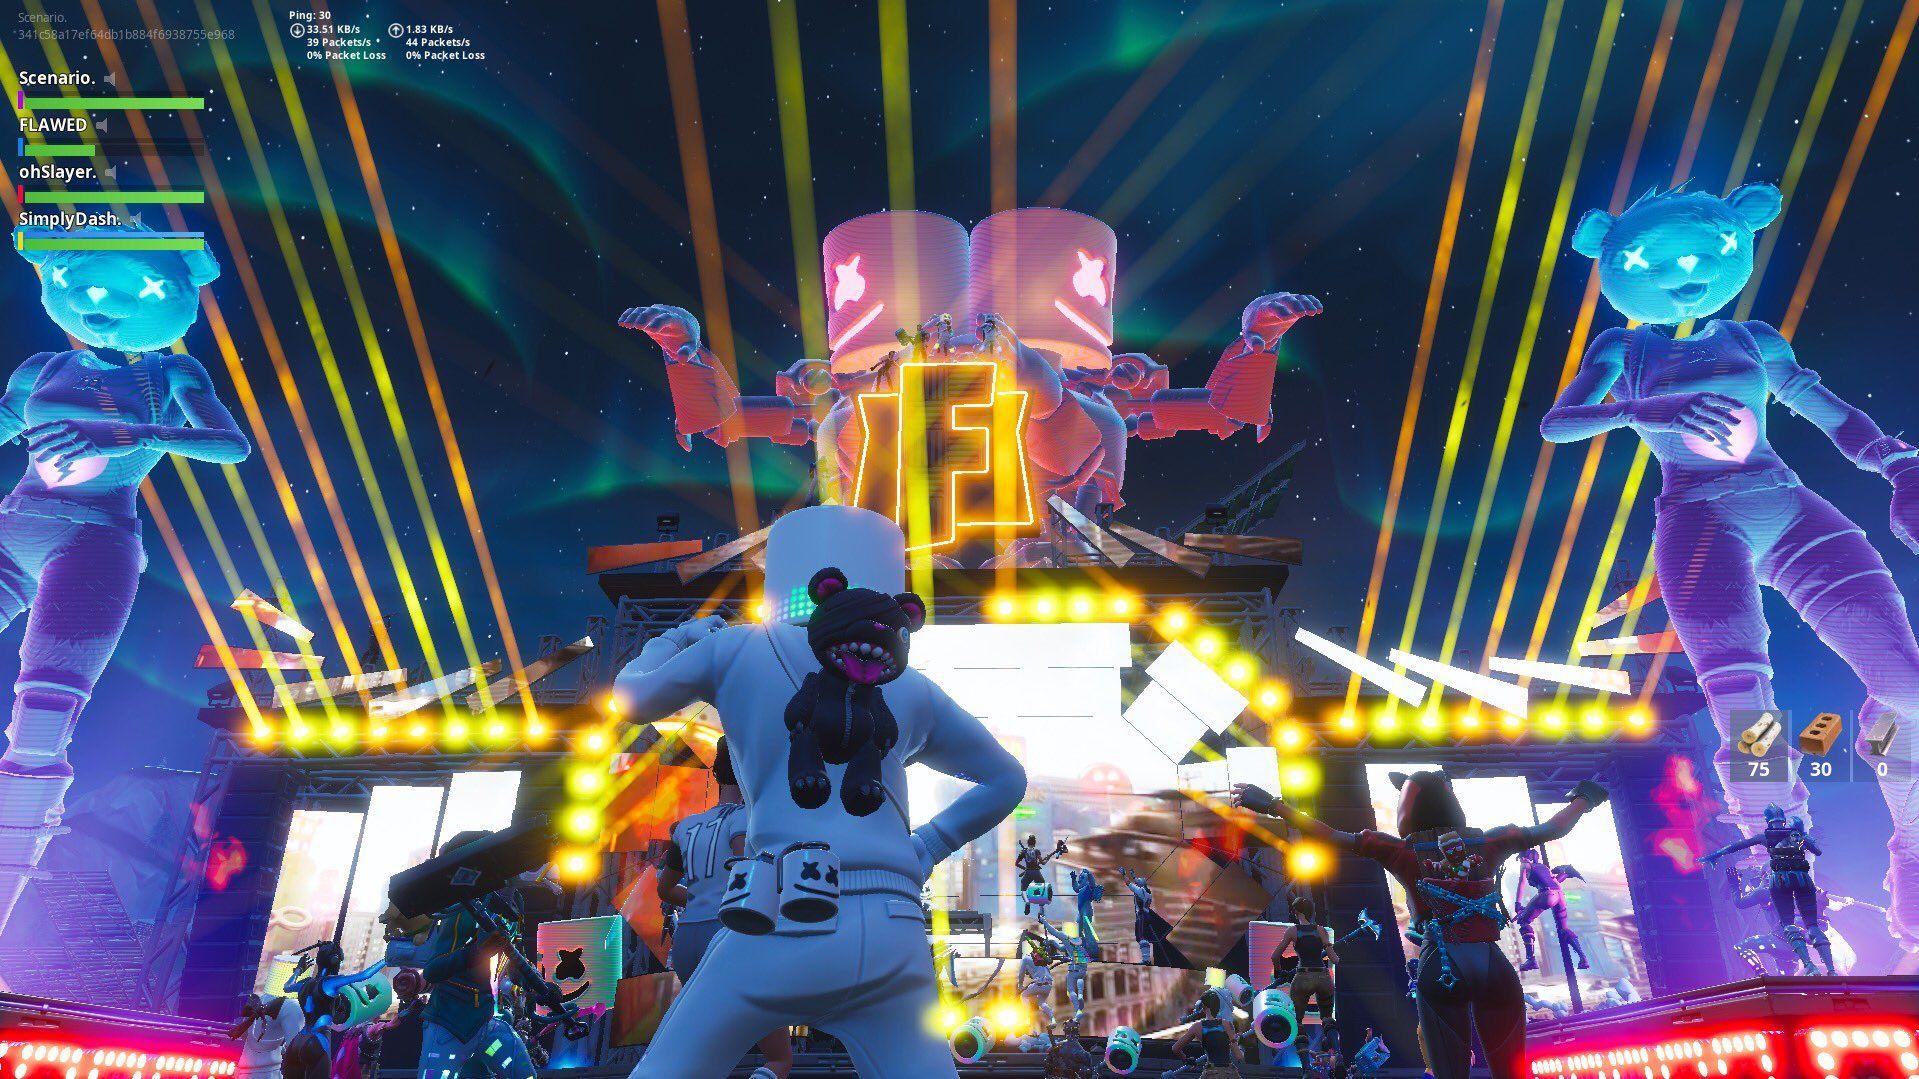 fortnite showtime event screen 2 - fortnite 30 packet loss